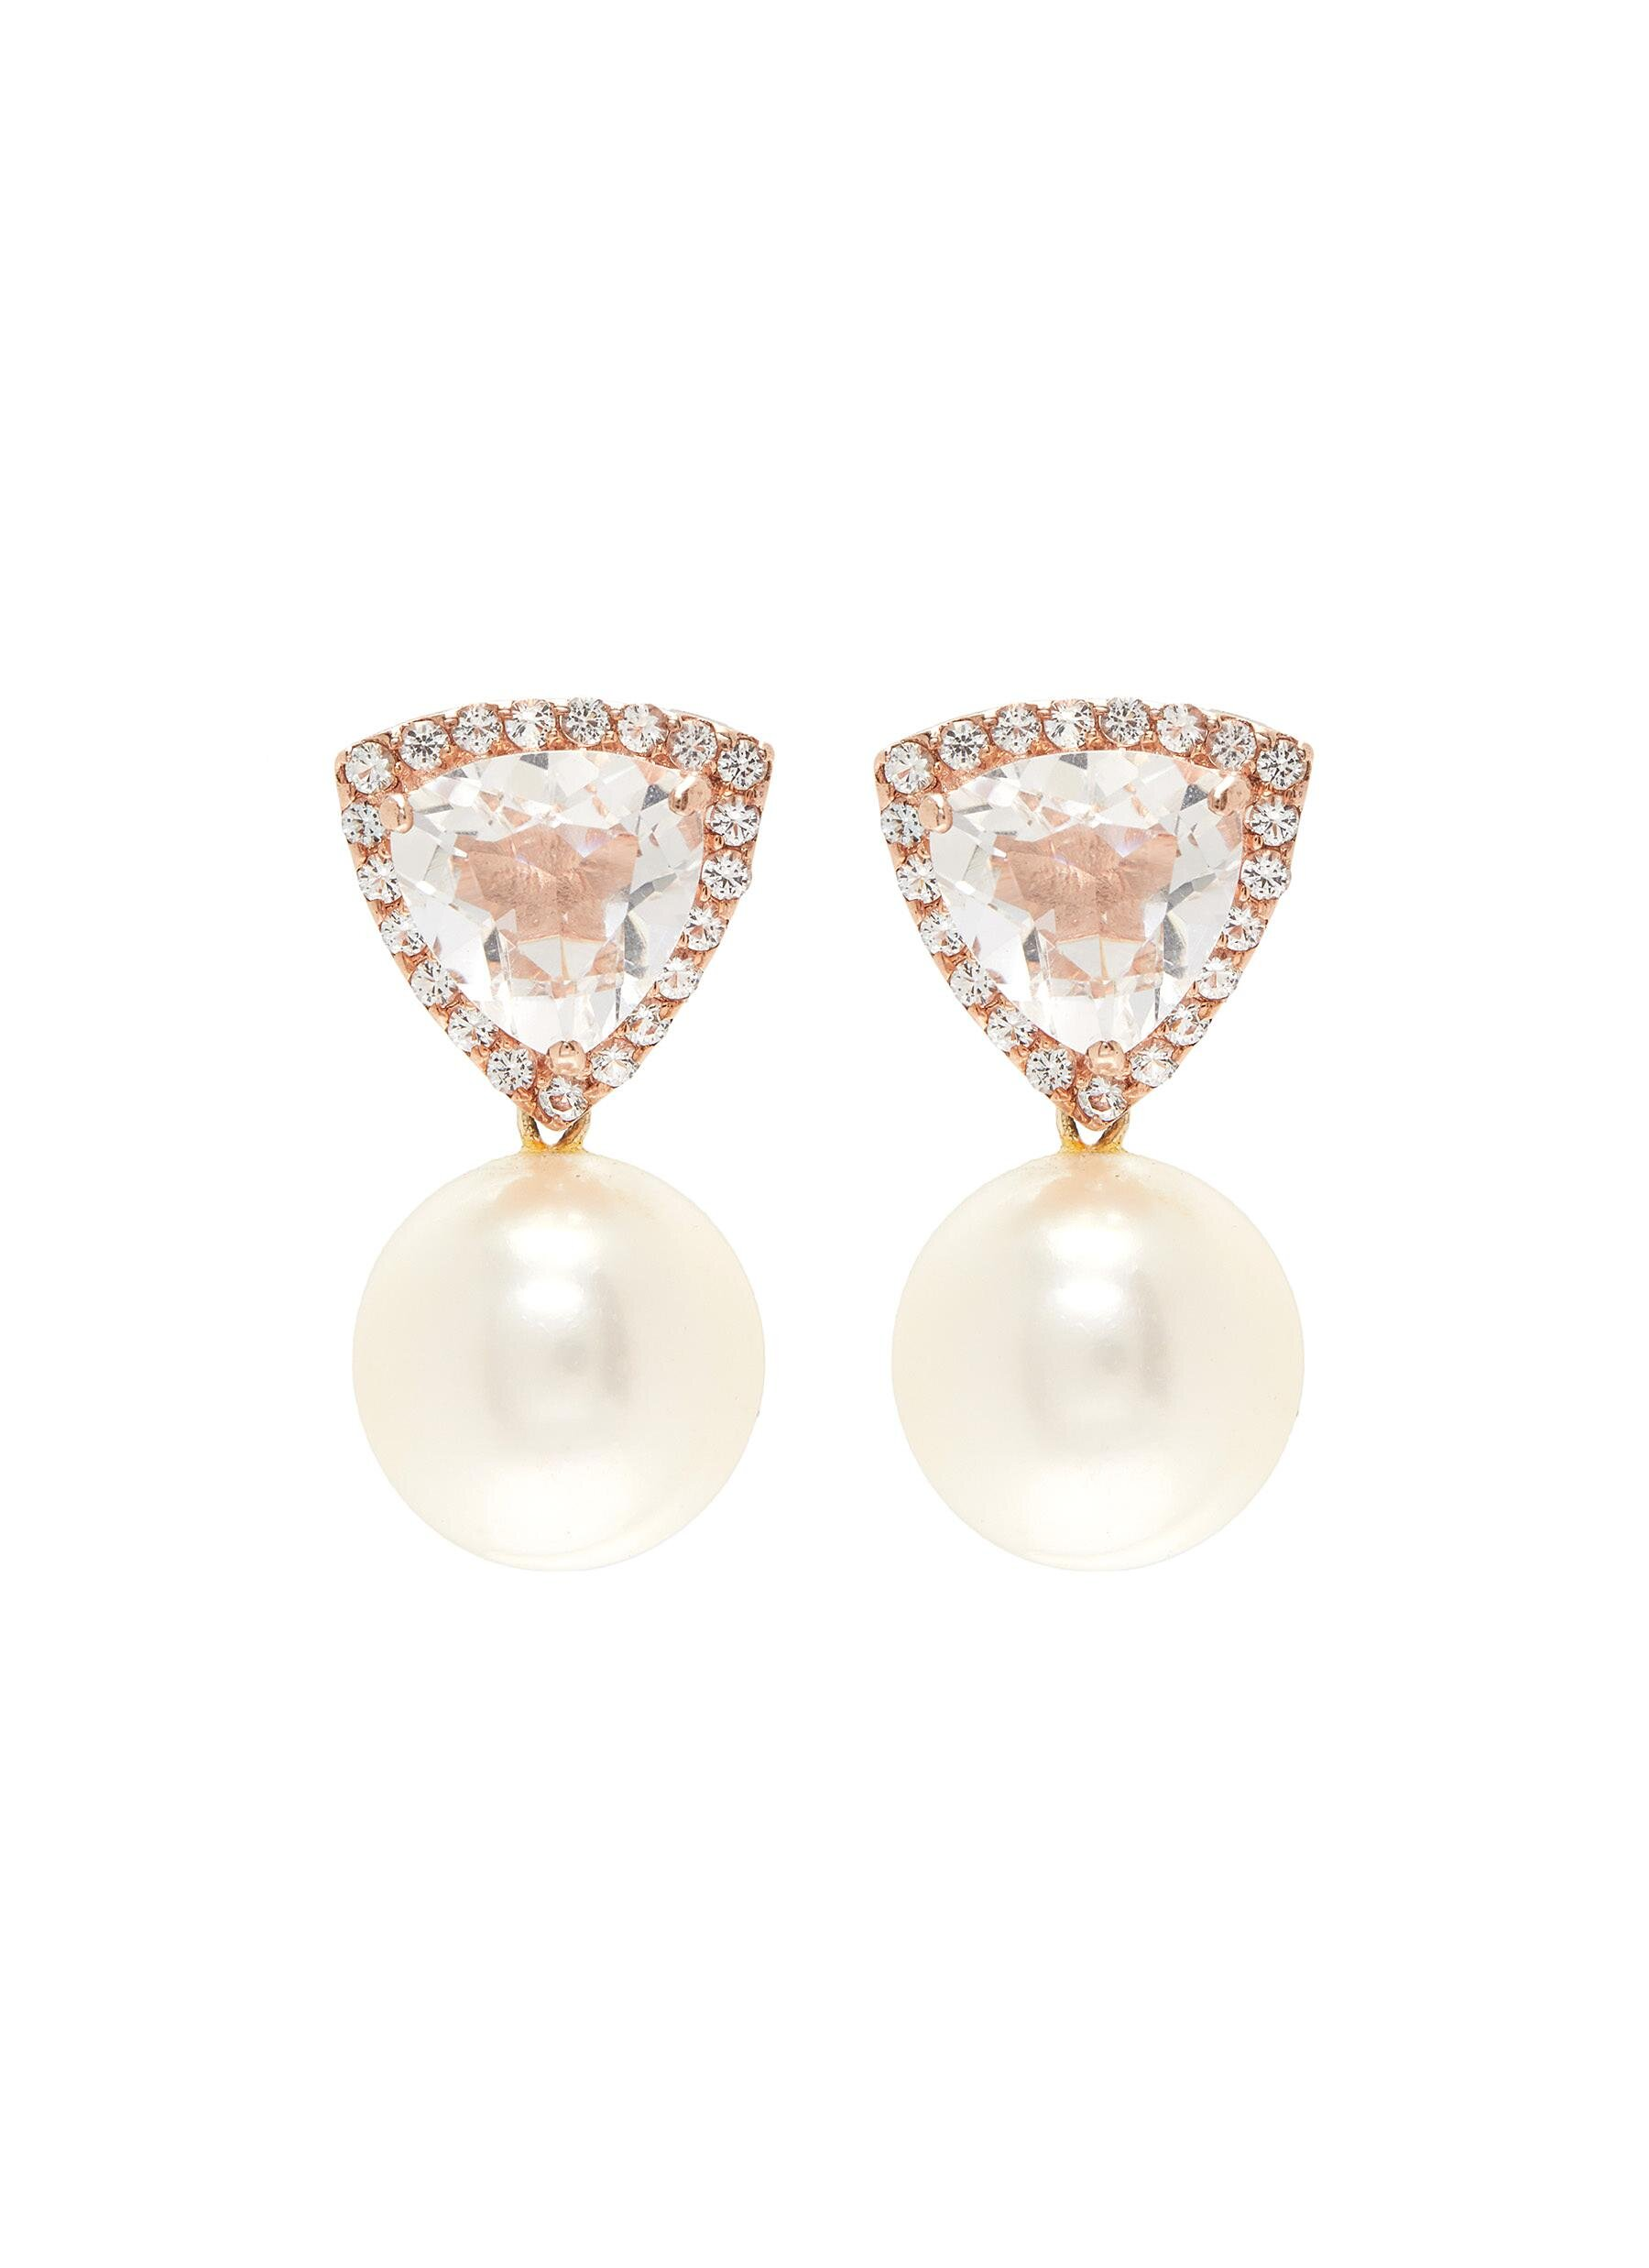 Butler & Wilson White Topaz And Drop Pearl Earrings  HKD$2,890